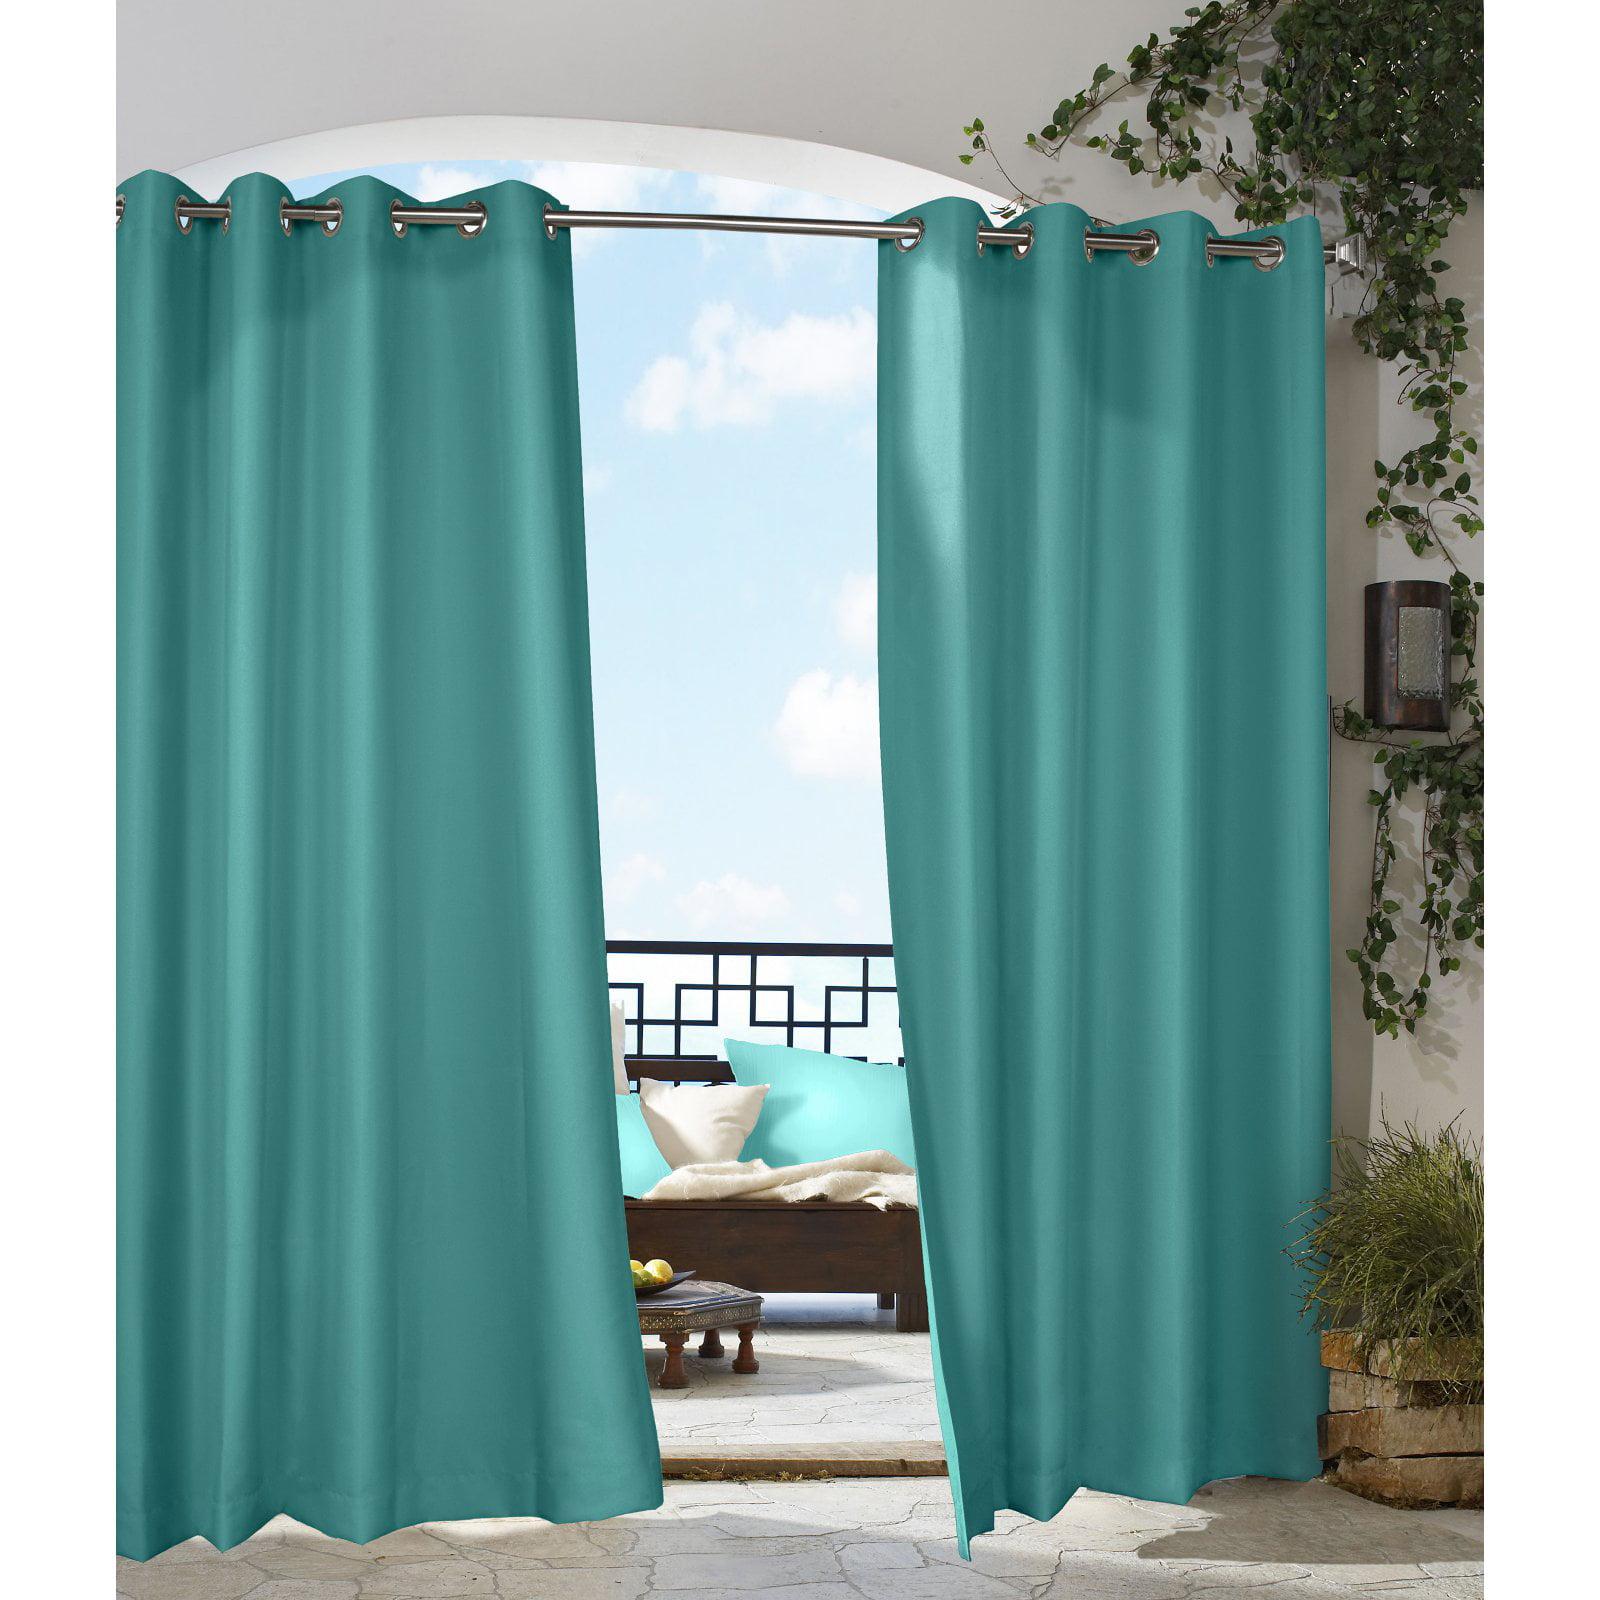 Commonwealth Outdoor Decor Gazebo Grommet Curtain Panel